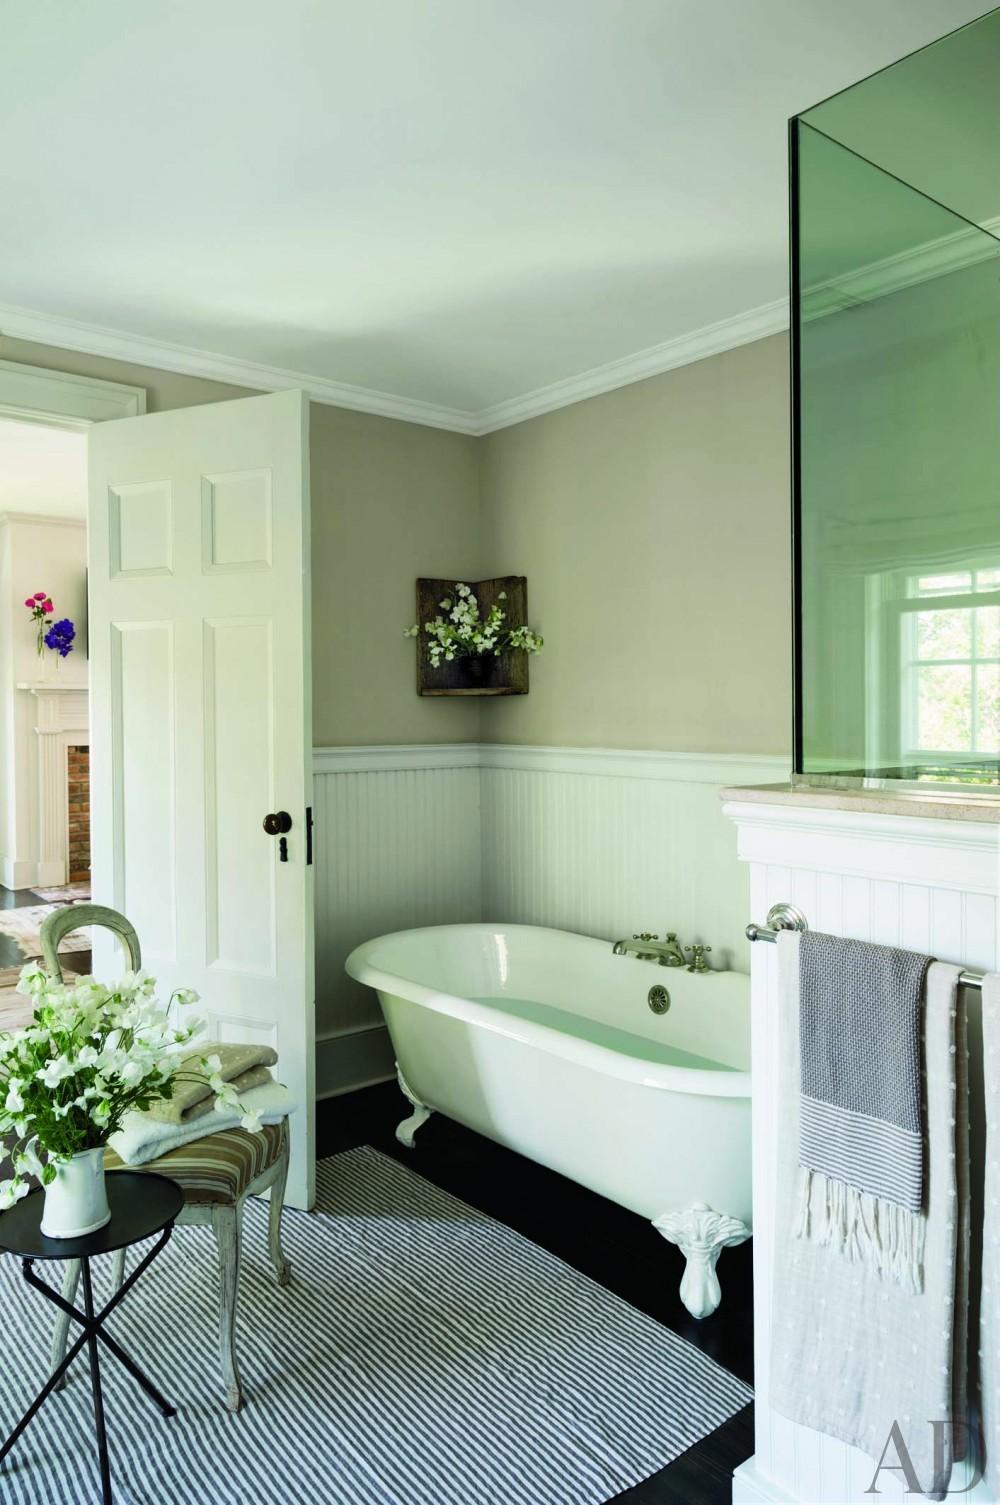 Contemporary Bathroom by Rebecca Bond in Bridgehampton, New York